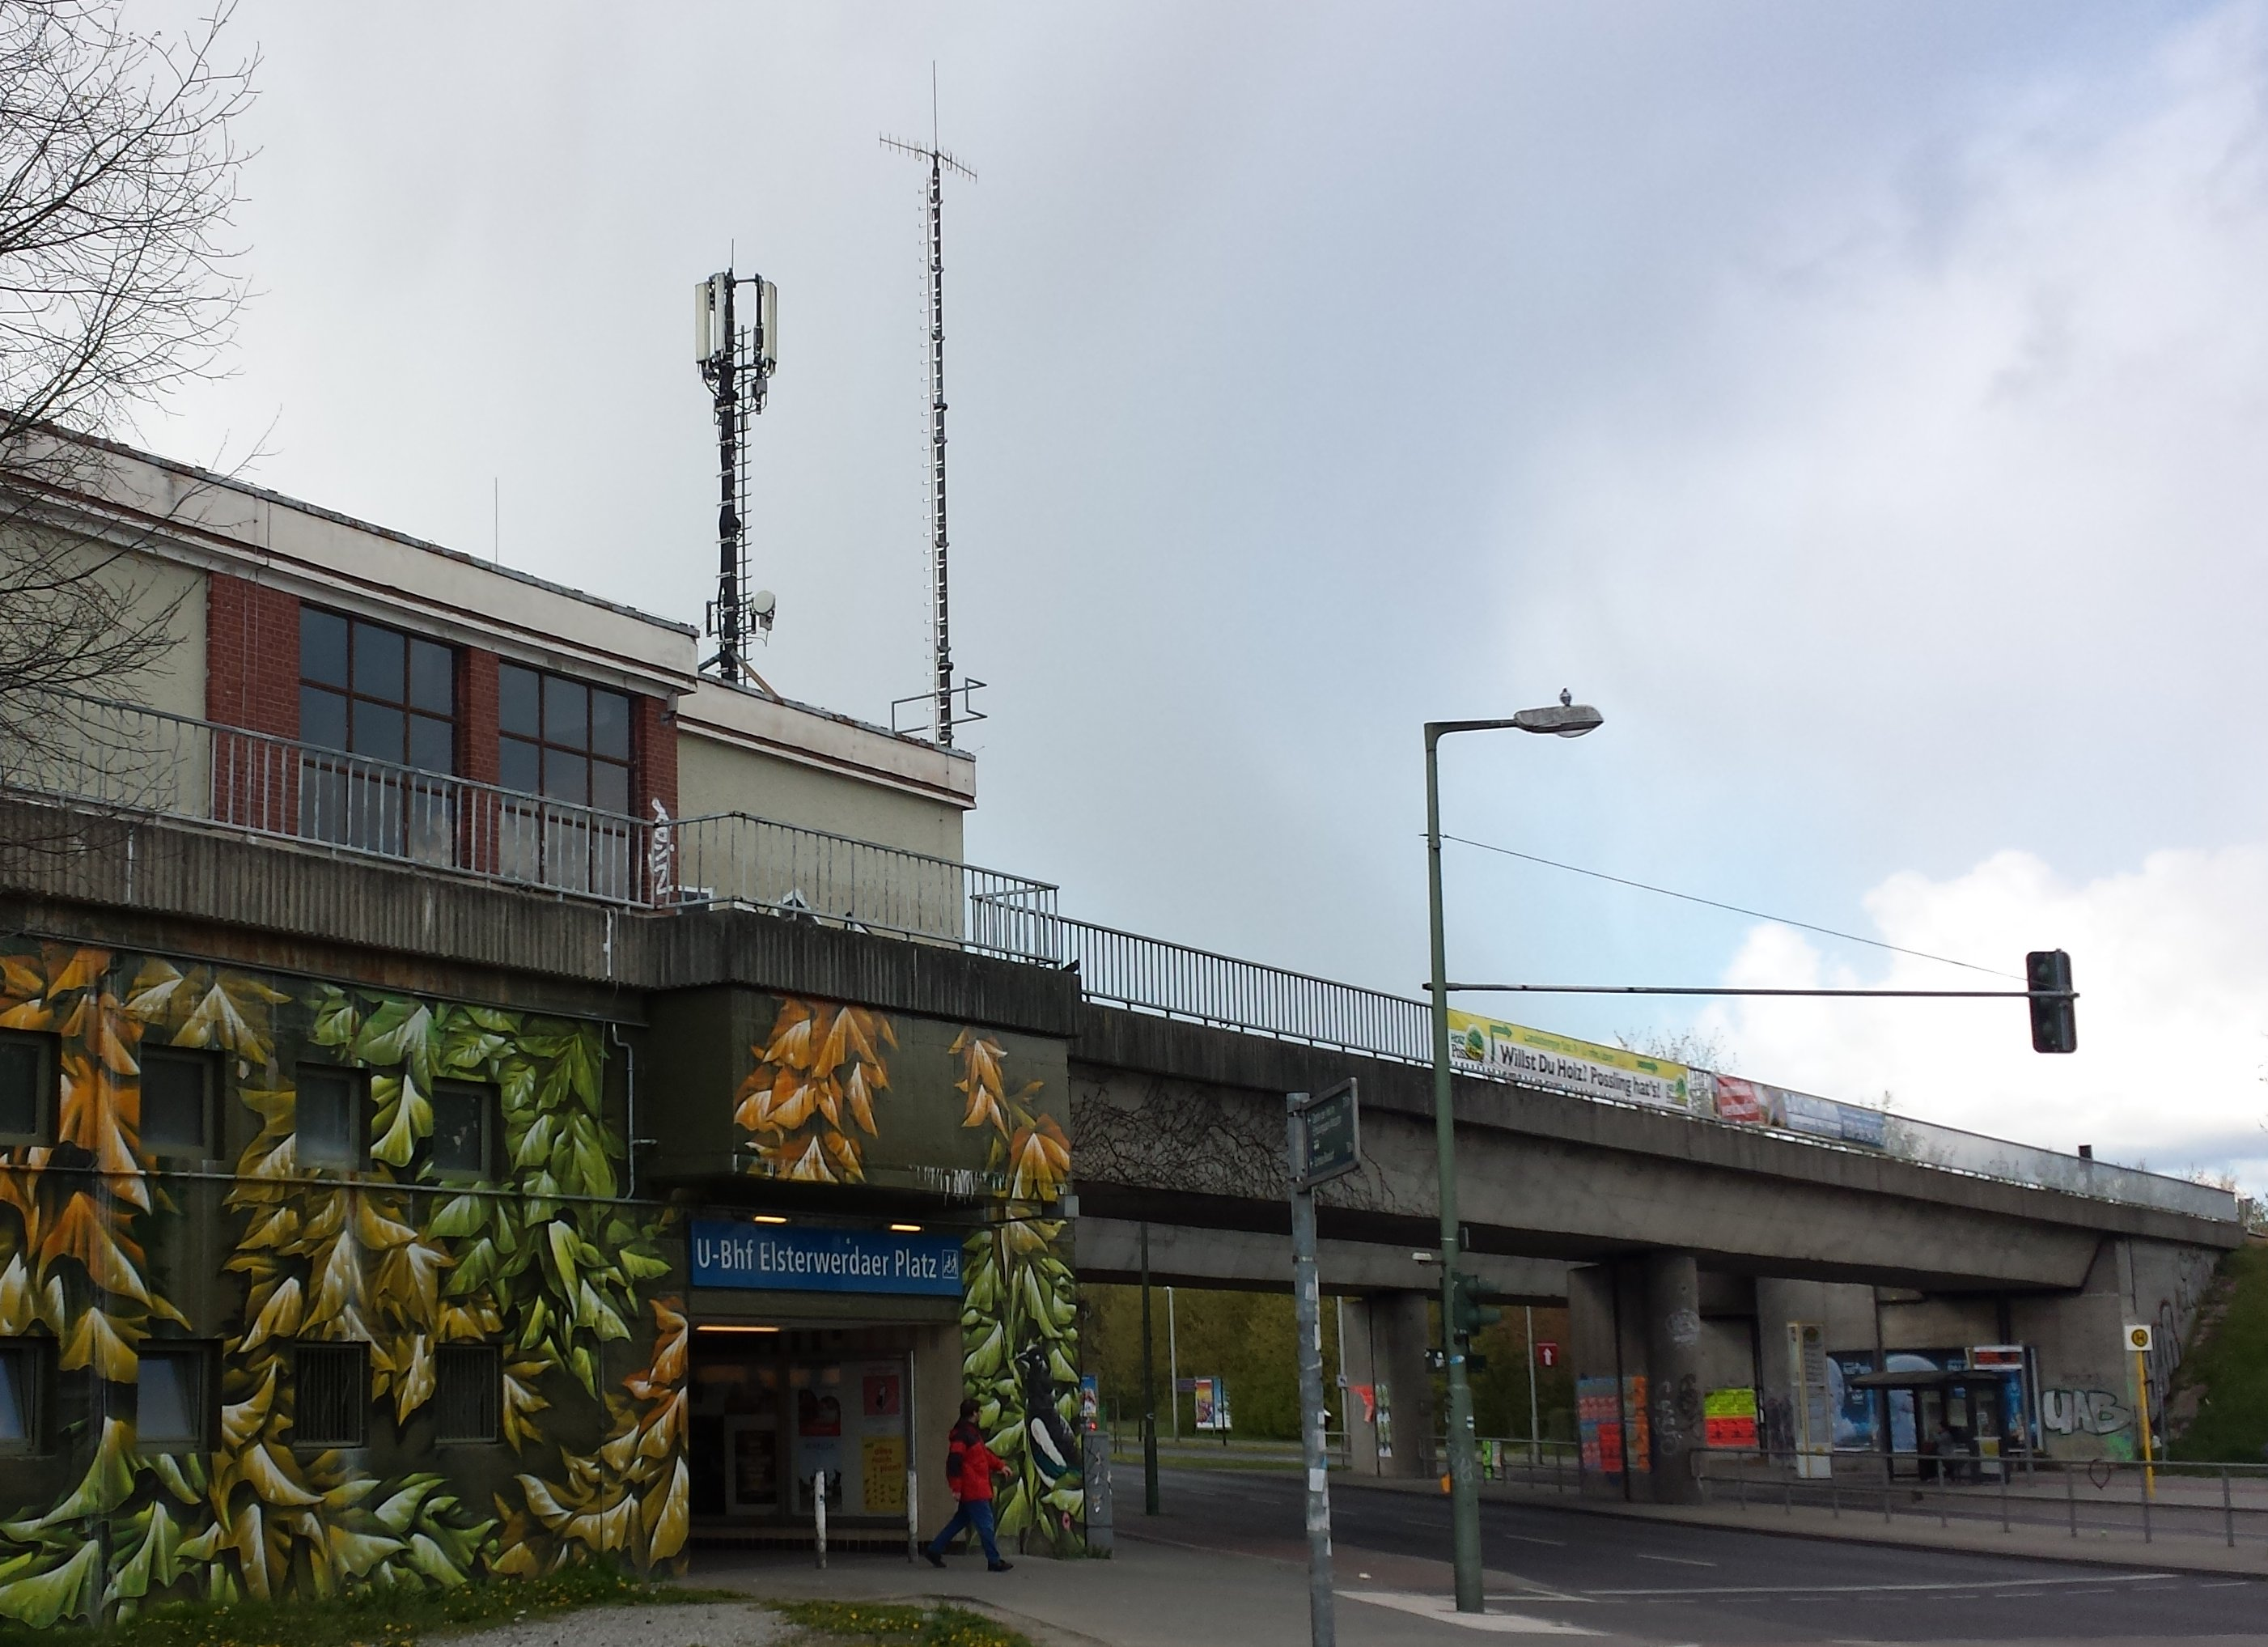 U-Bahnhof Elsterwerdaer Platz